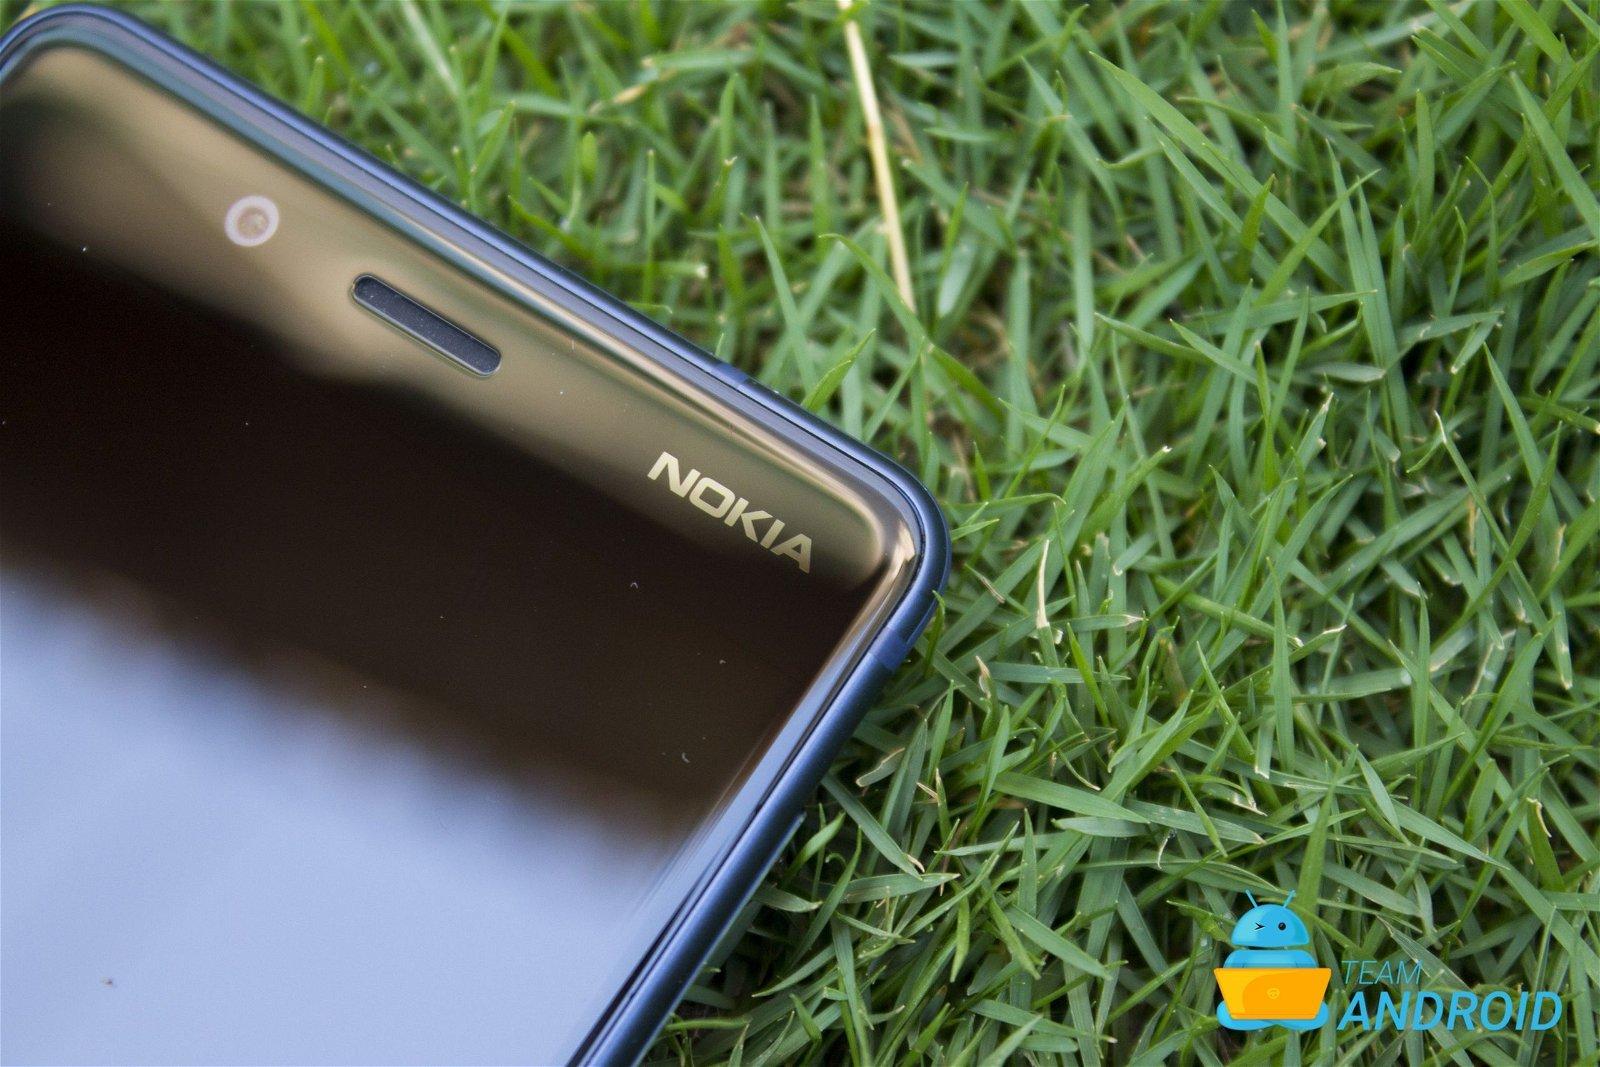 Nokia 8 Review - Design, Hardware, Camera and Software 62